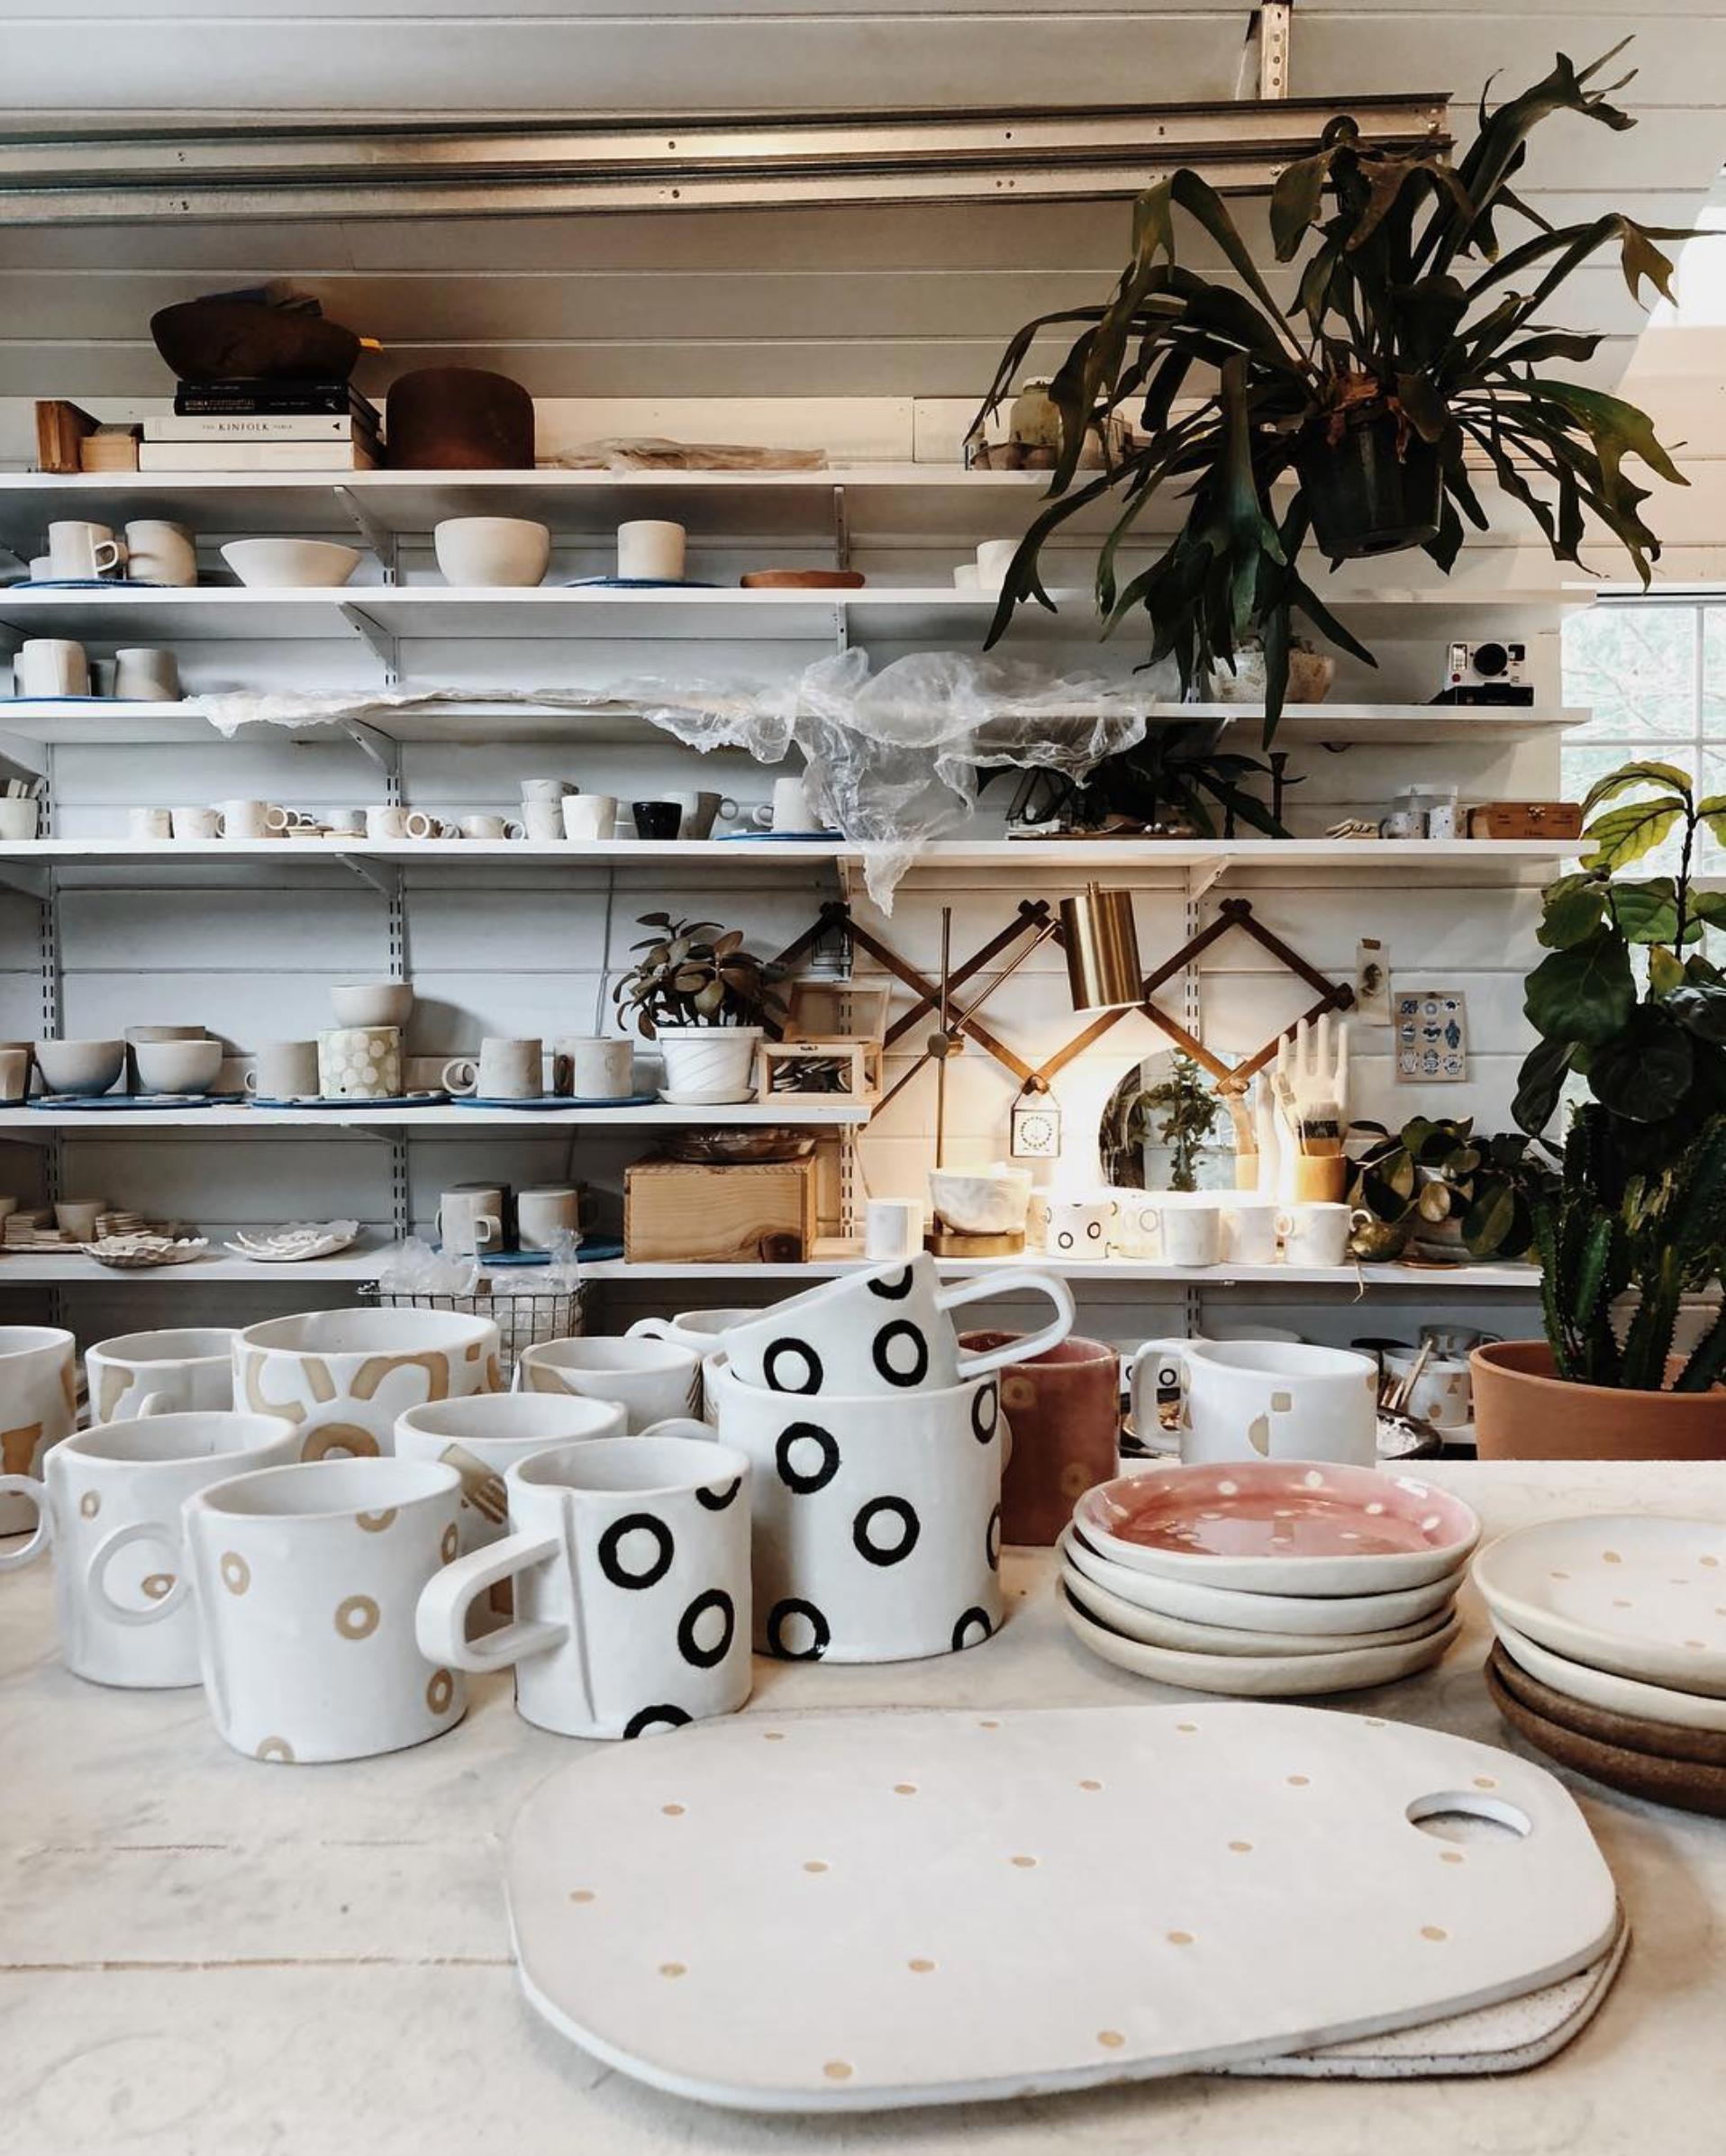 Where Makers Make_Natasha Lawyer_Sugarhouse Ceramics_Studio 2.png